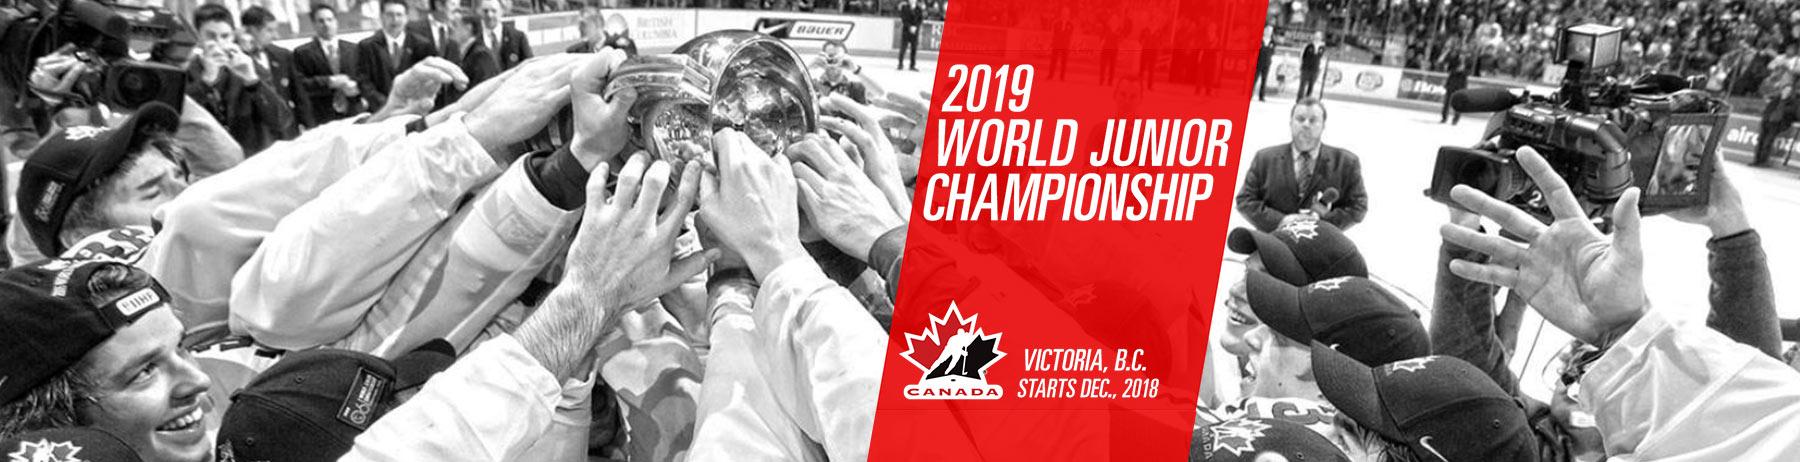 full schedule: 2019 World Junior Championships games in Victoria